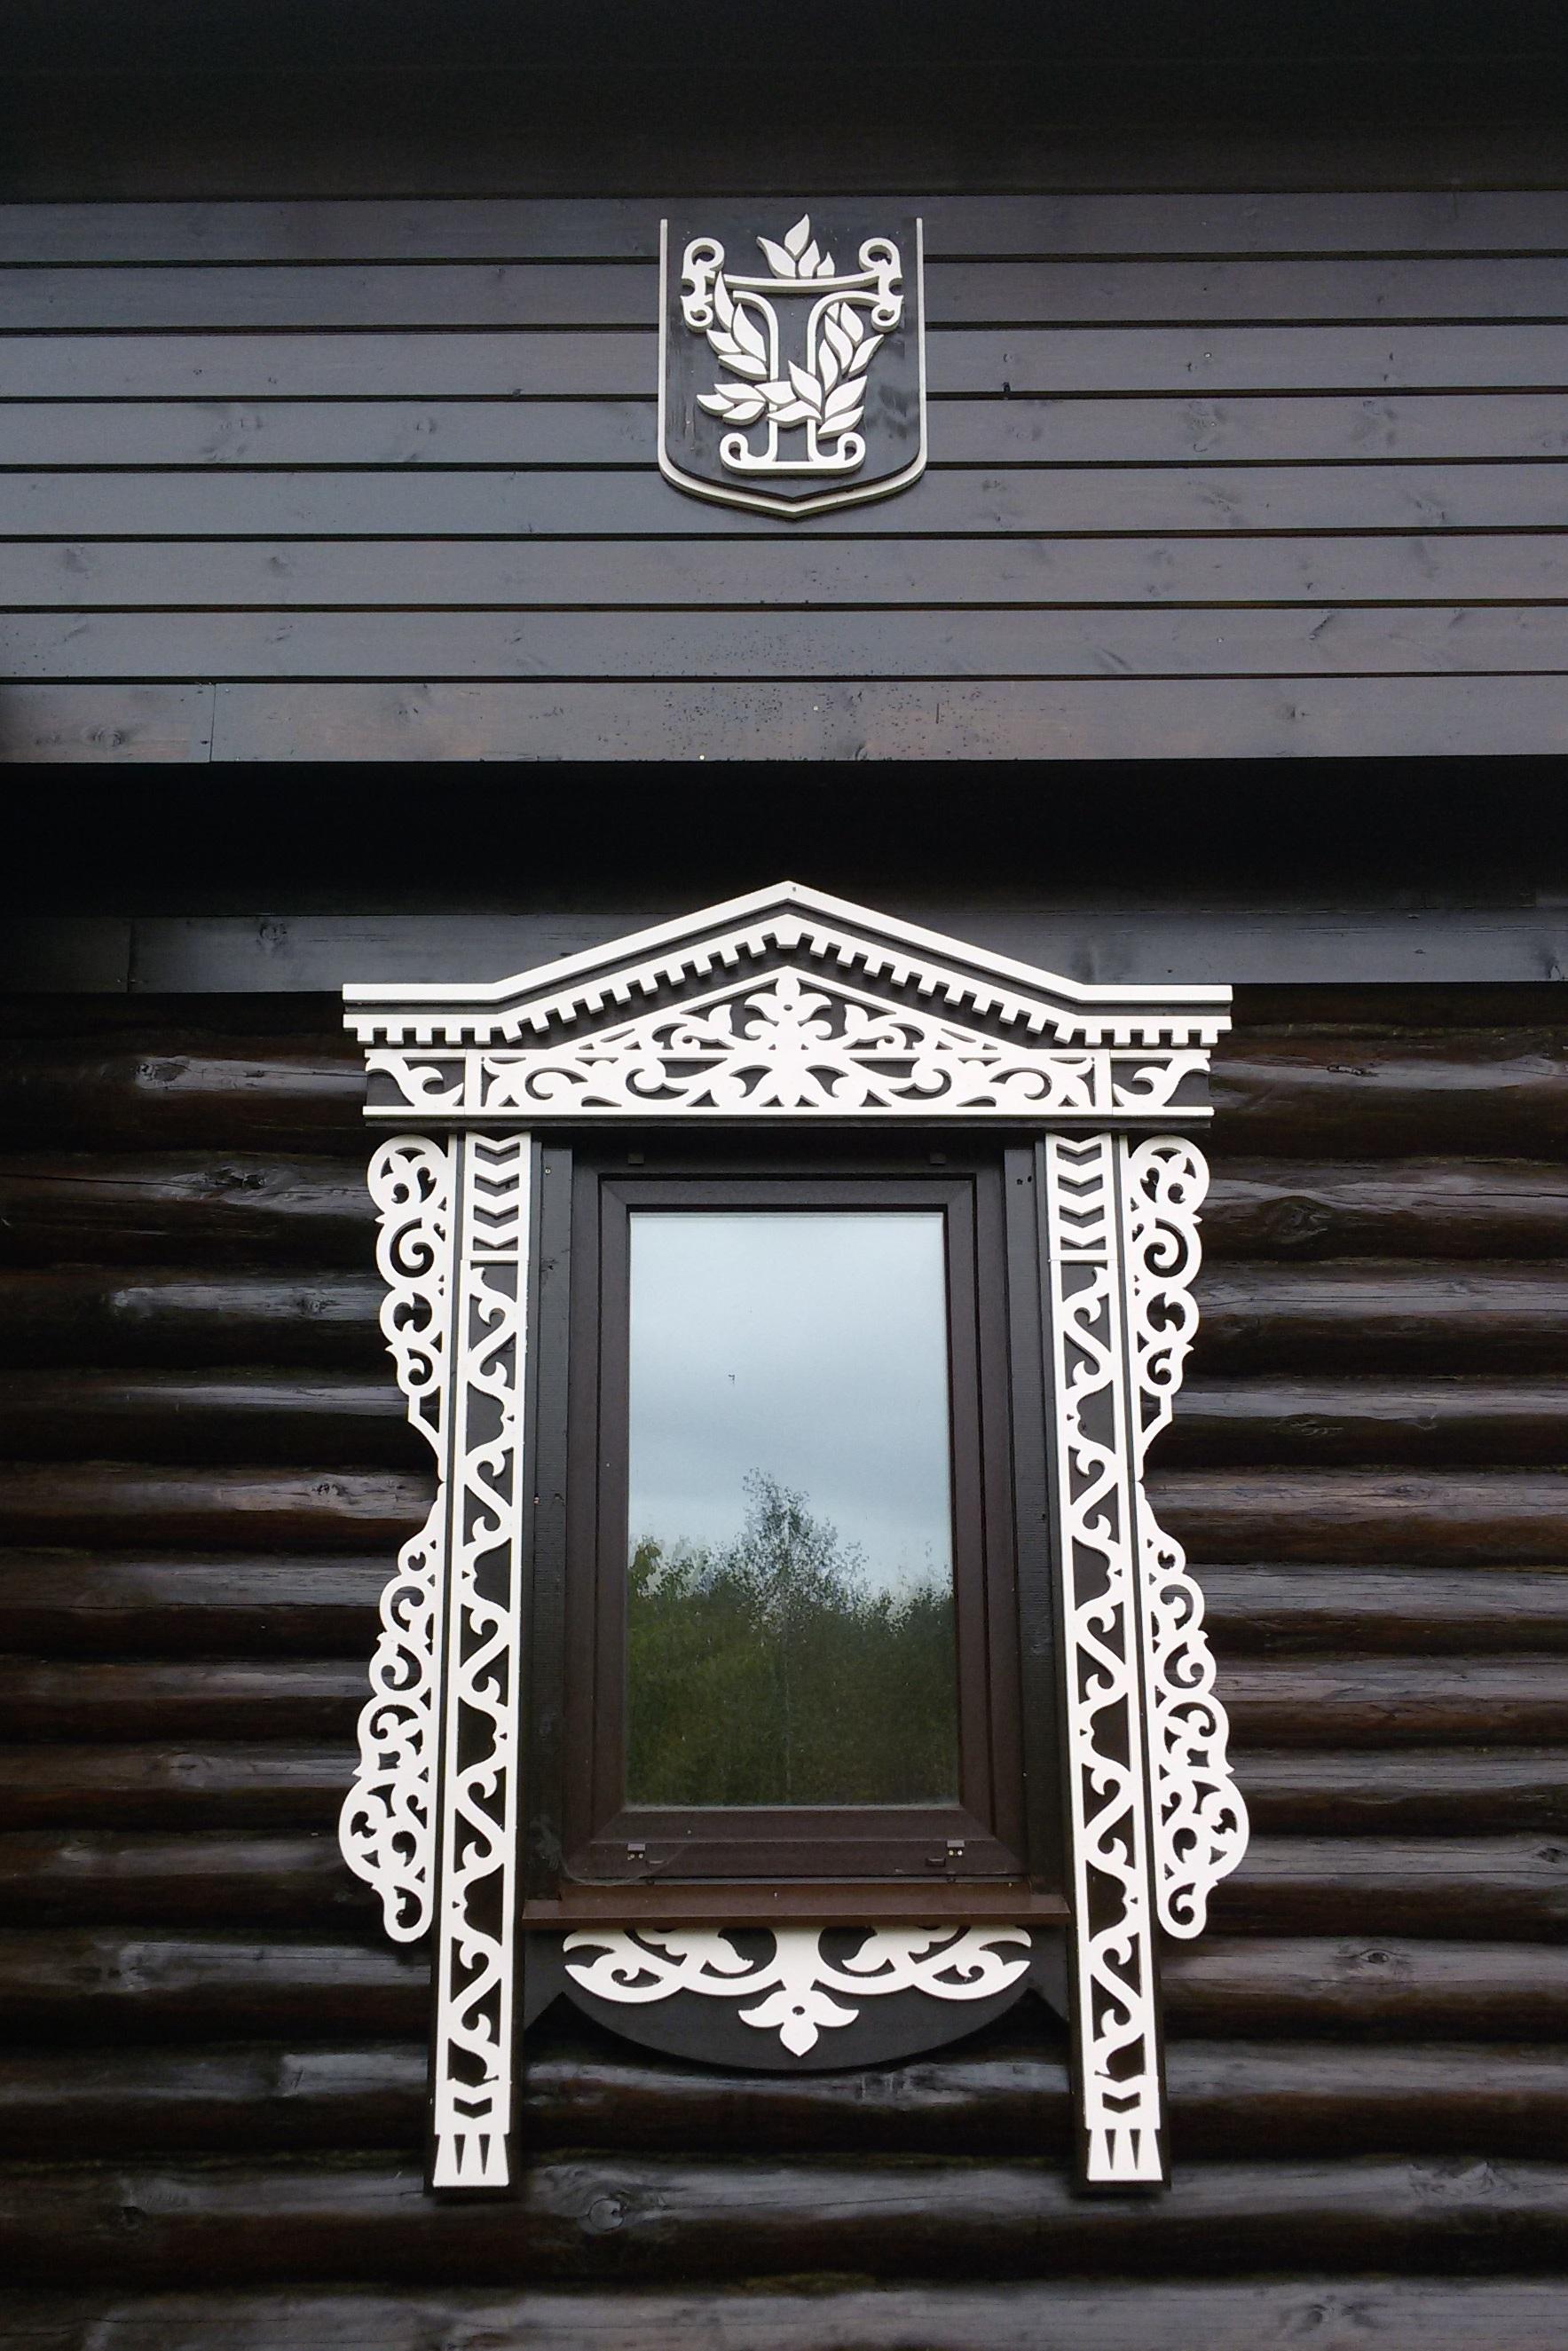 Резной орнамента на фасаде